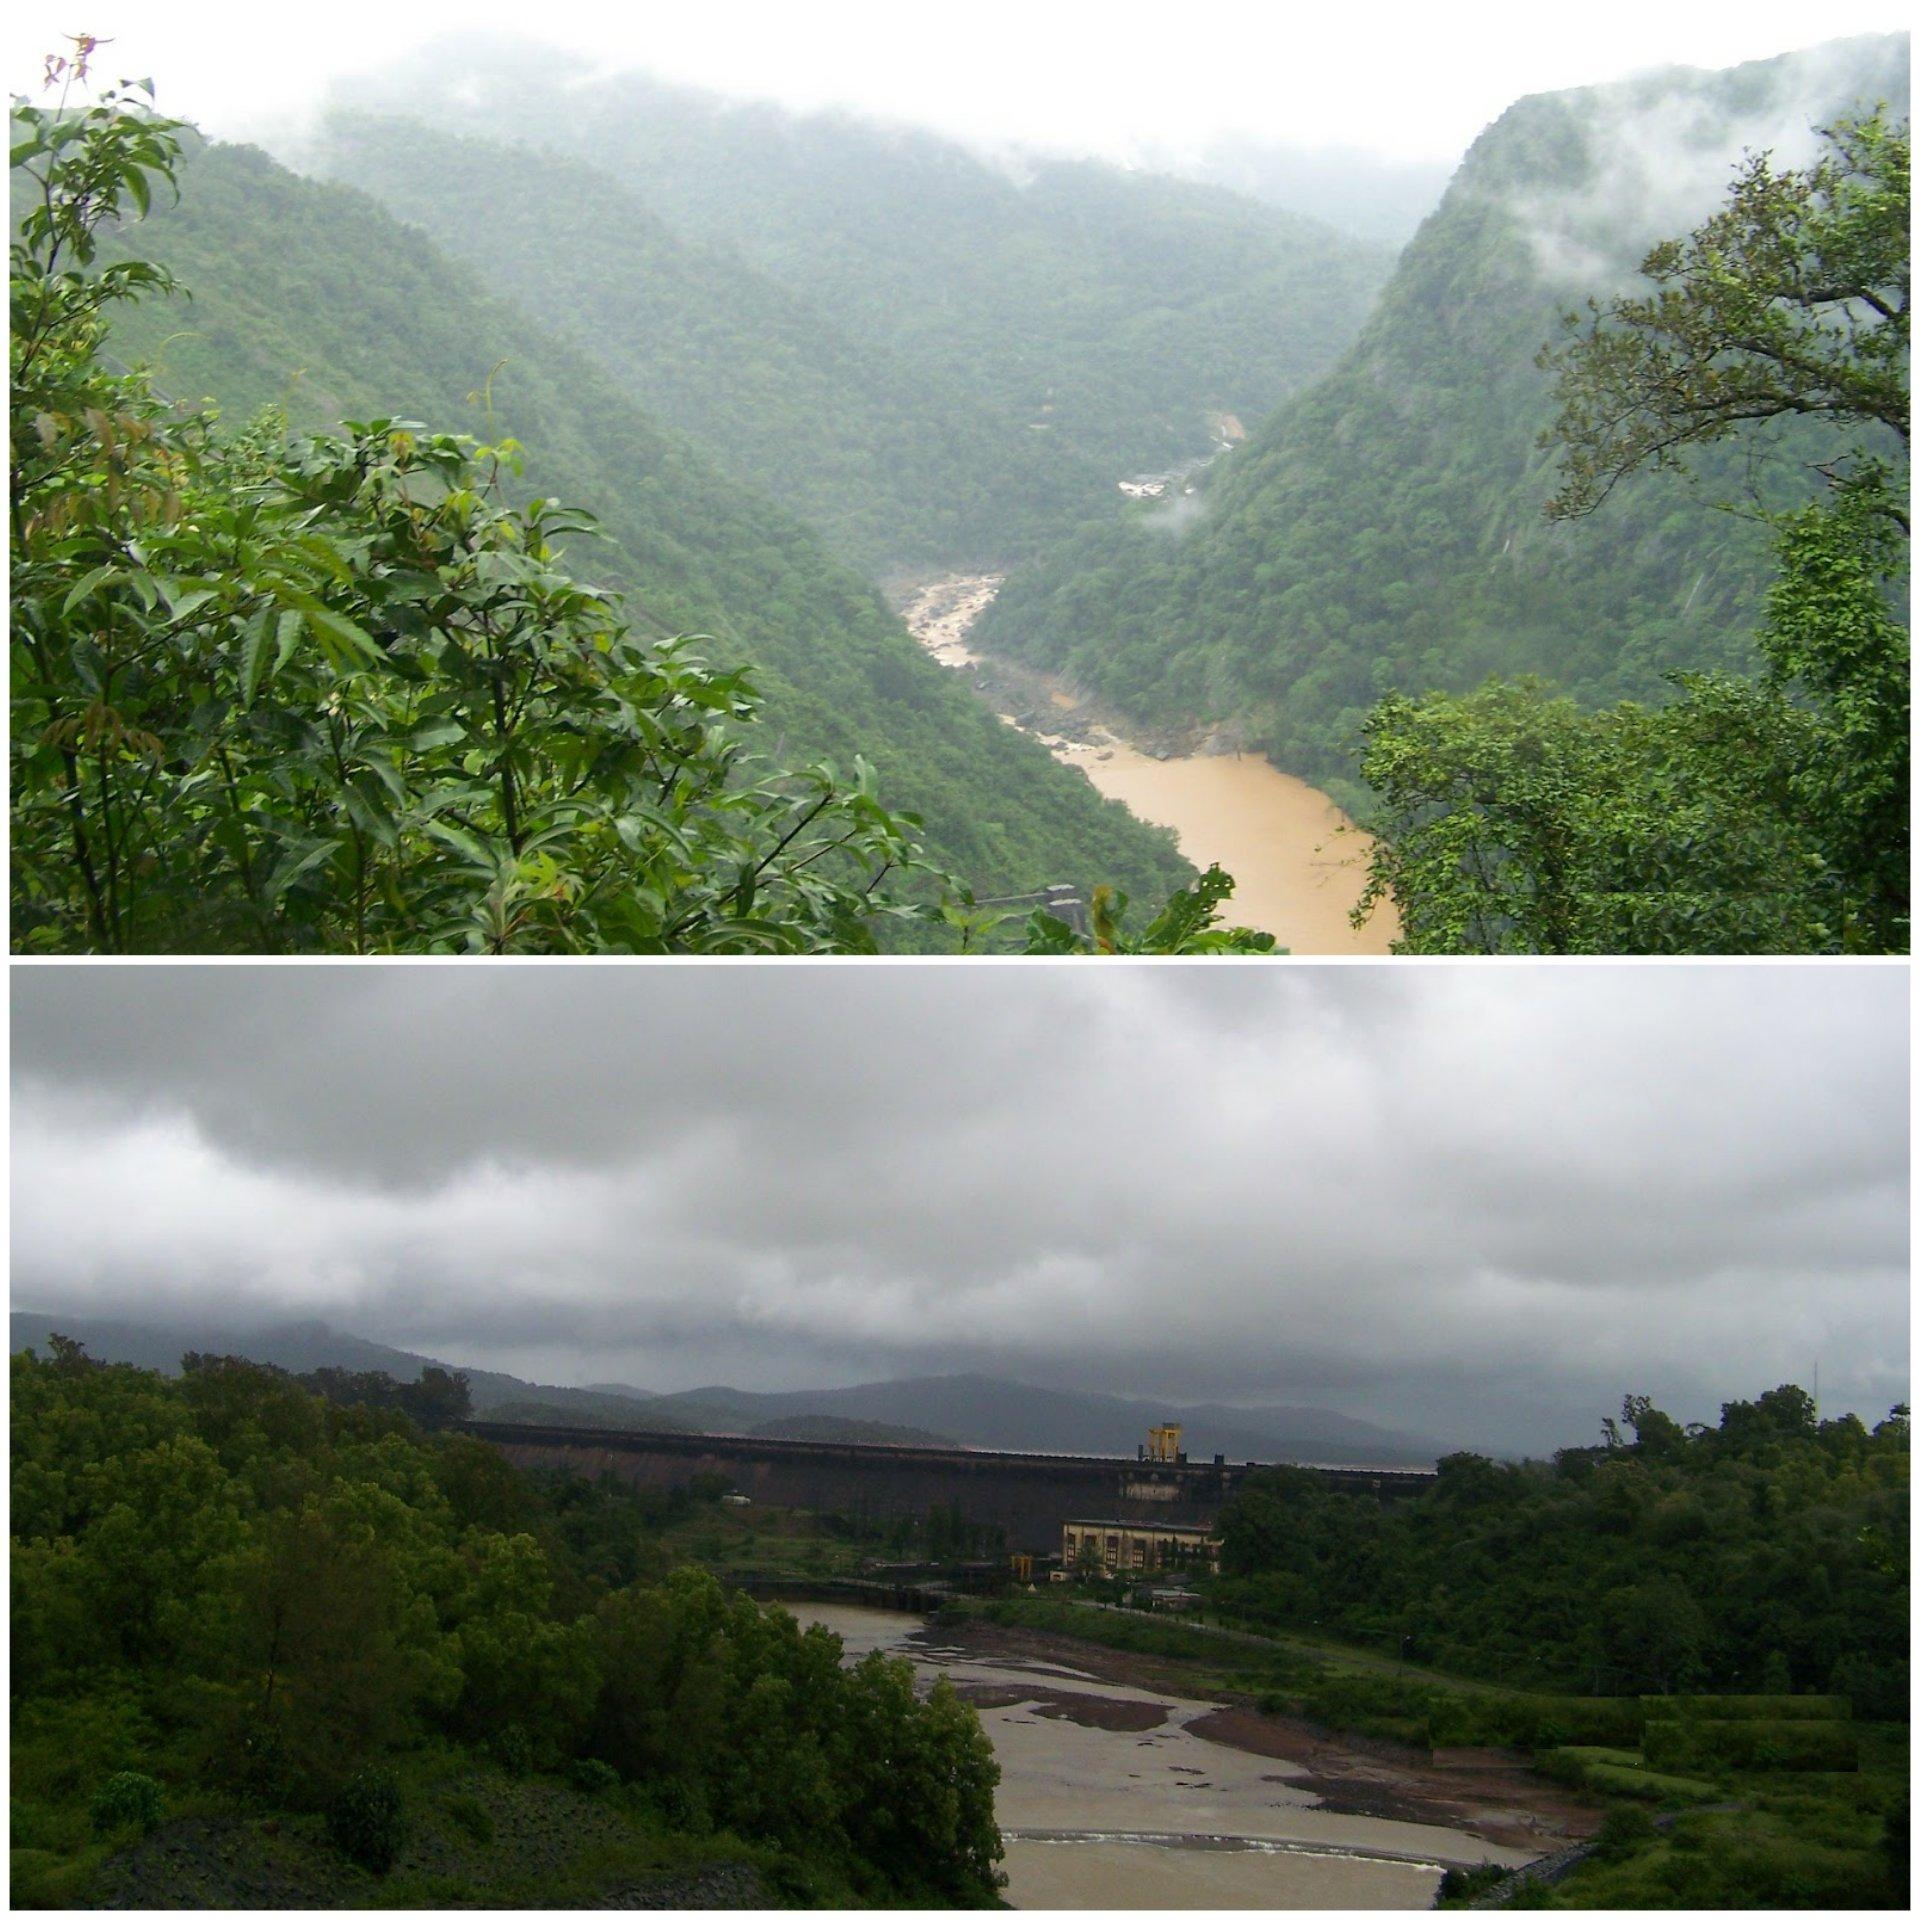 Views of the Sharavati project around Jog falls